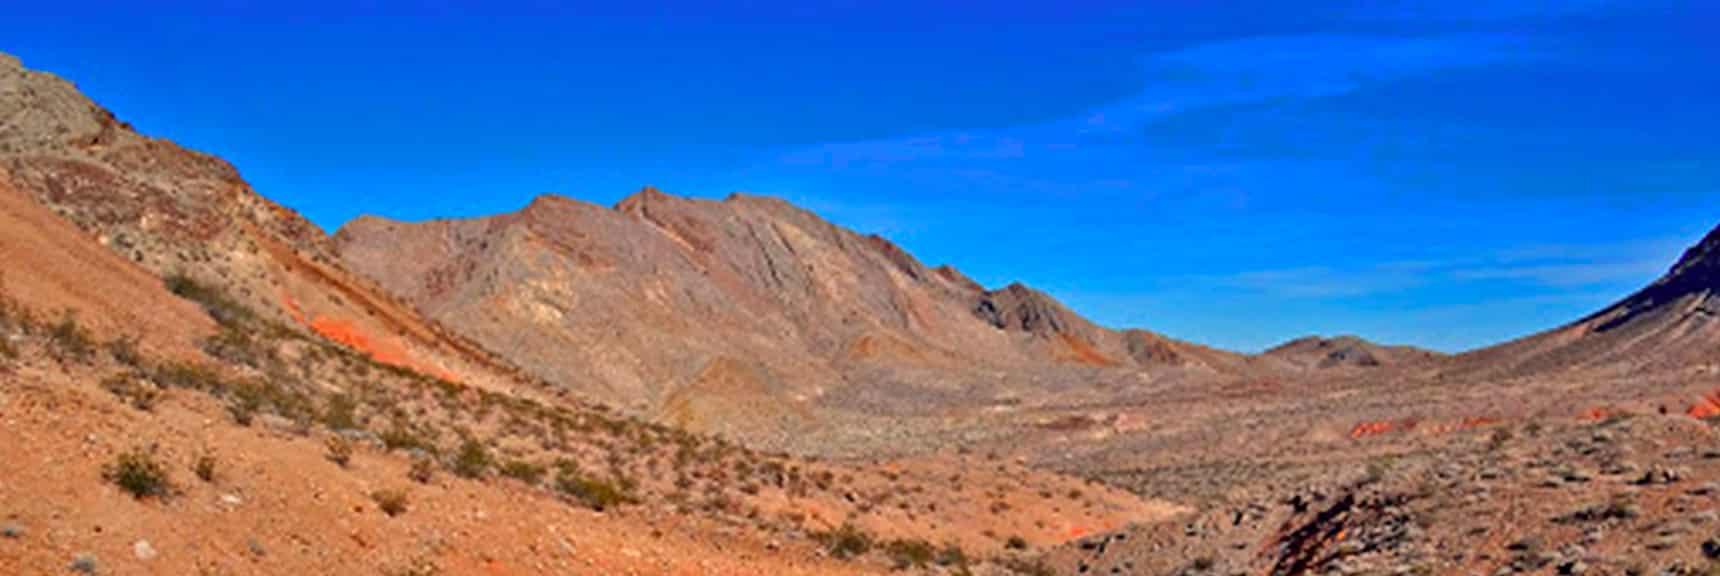 Sunrise Mountain West of Lake Mead National Recreation Area, Nevada